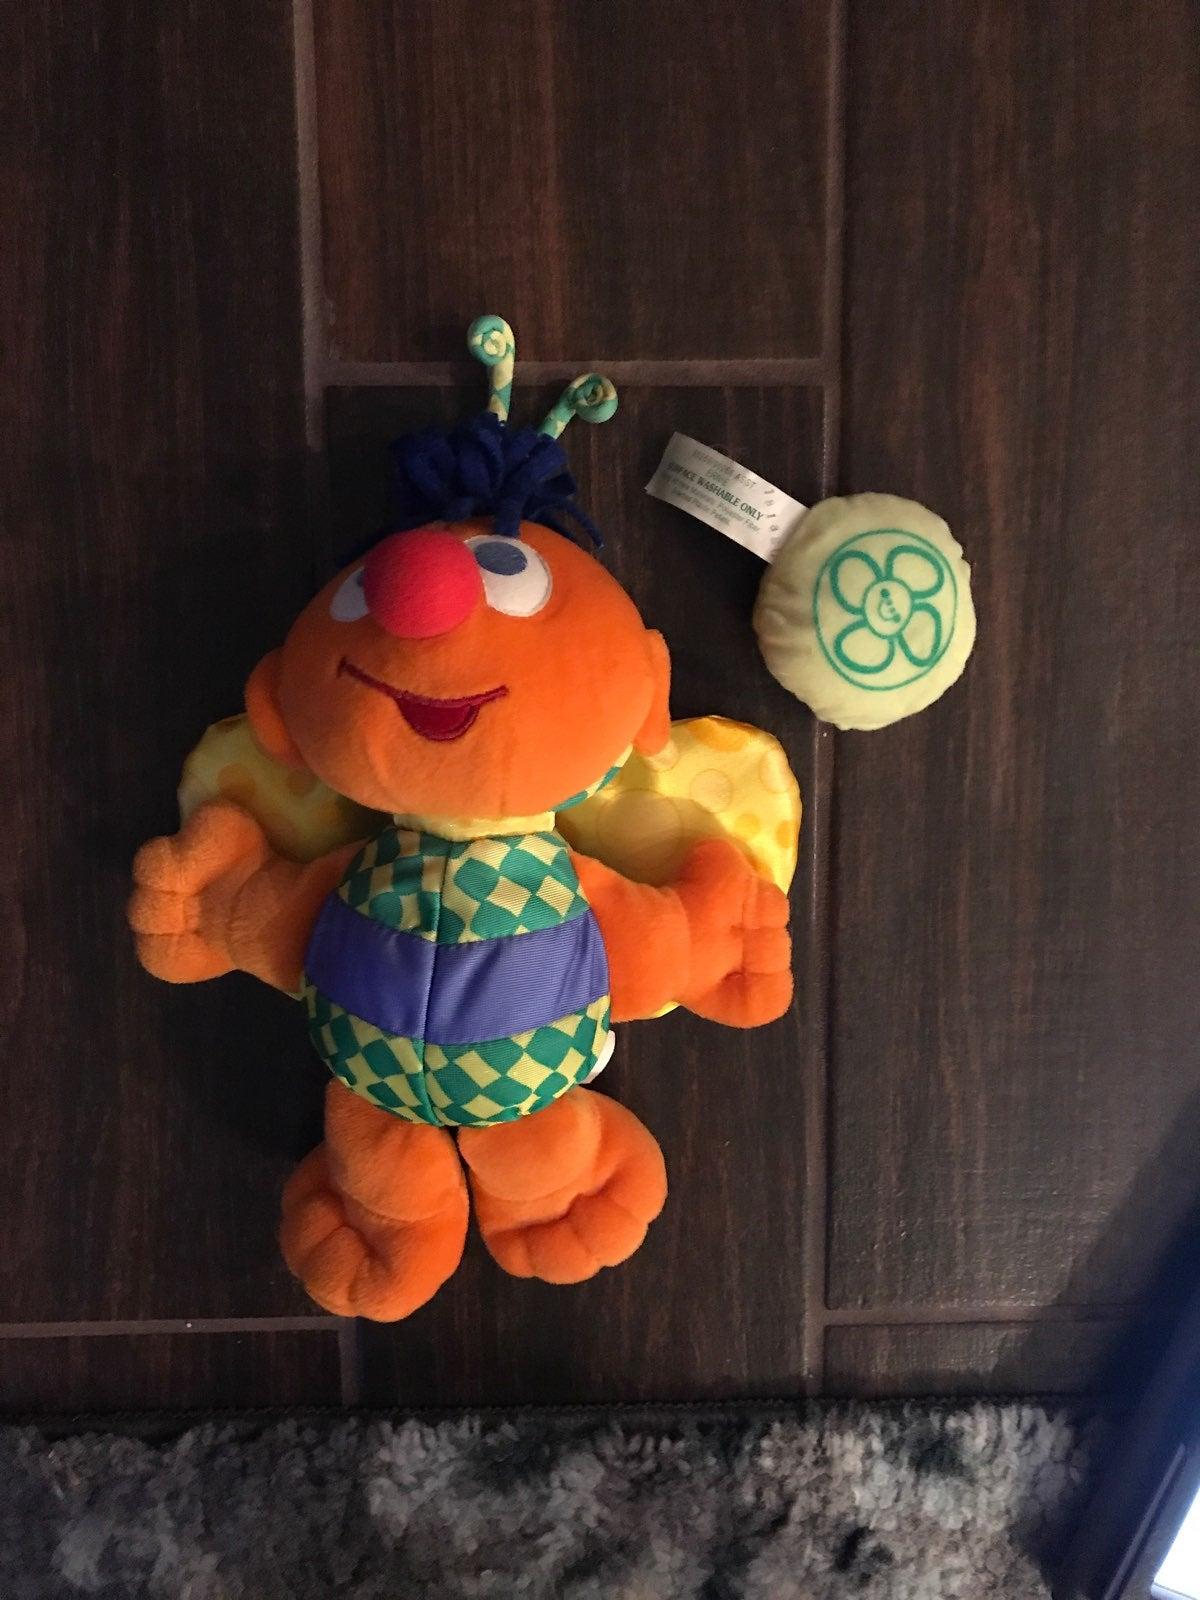 2001 Sesame Street Ernie Plush